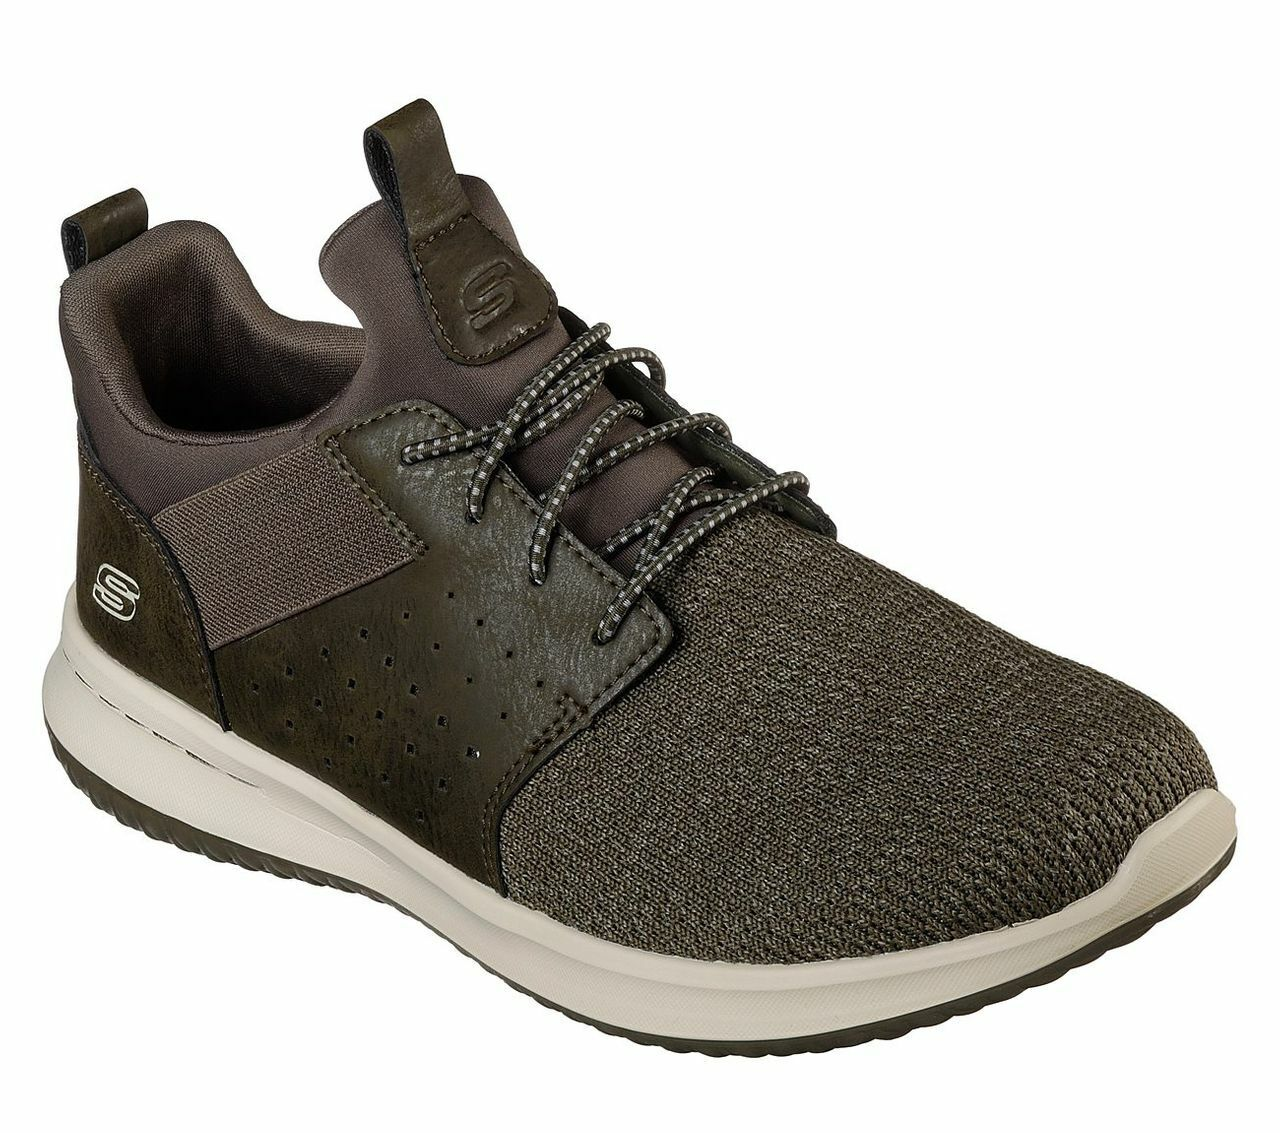 Skechers Men estados unidos Delson camben zapatillas zapatos caballero verde